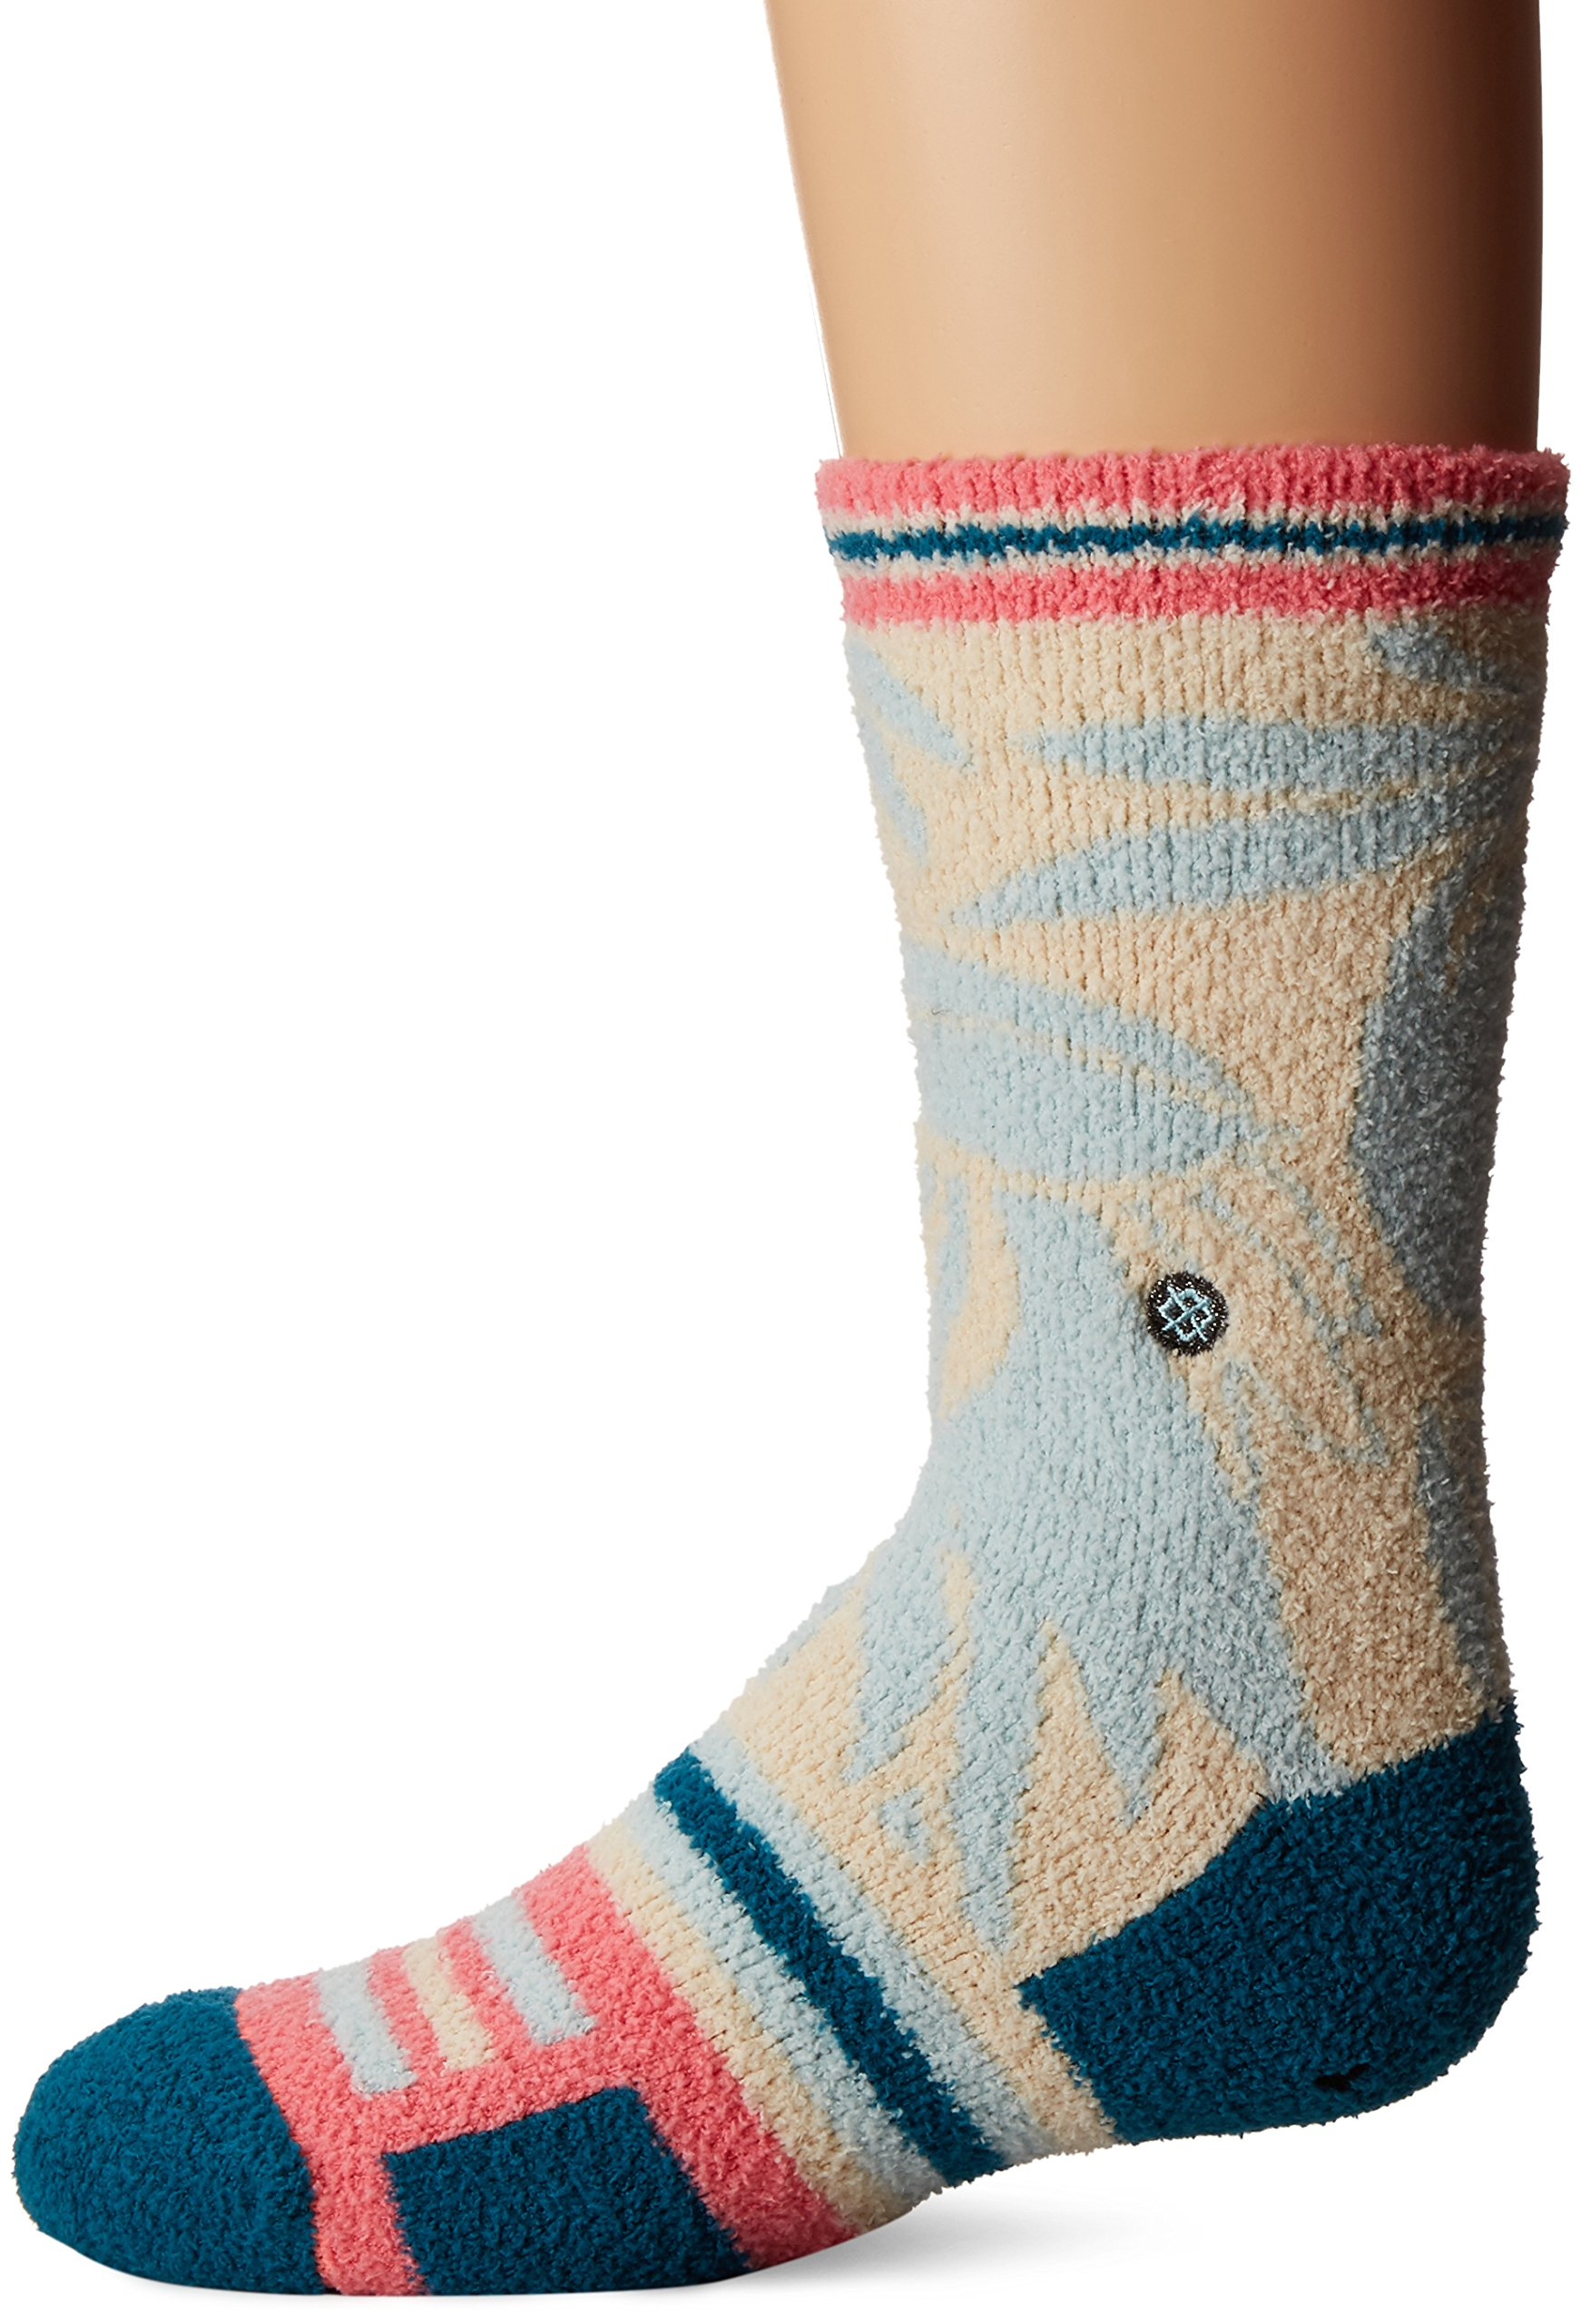 Stance Little Girls' Makame Floral Stripe Reinforced Toe Arch Support Crew Sock, Blue, L